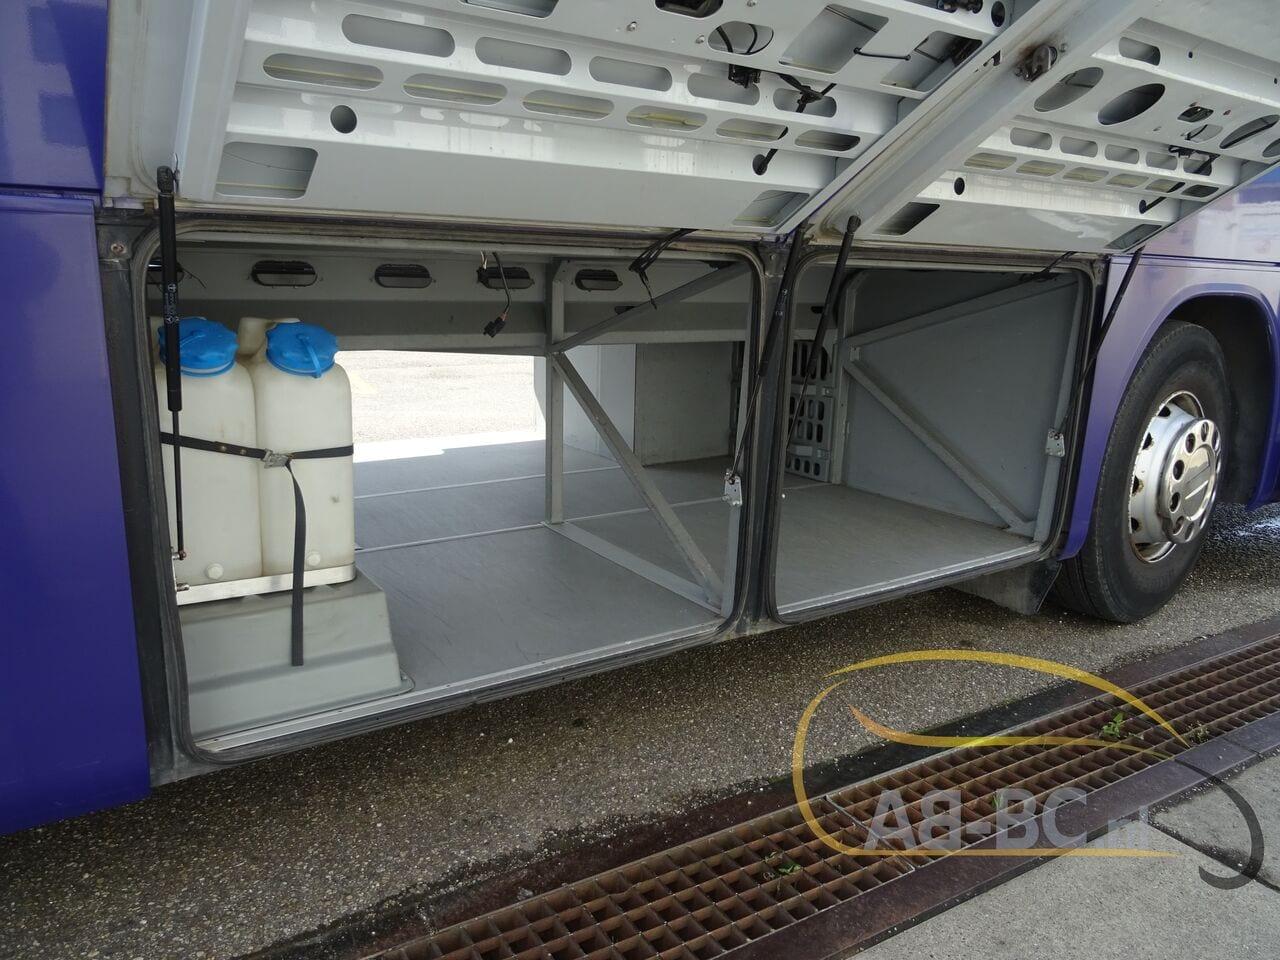 coach-busSETRA-S416H-48-SEATS-LIFTBUS---1620309554866053402_big_b980ae07a727307ce603ebcd529282c9--21050616581387095000